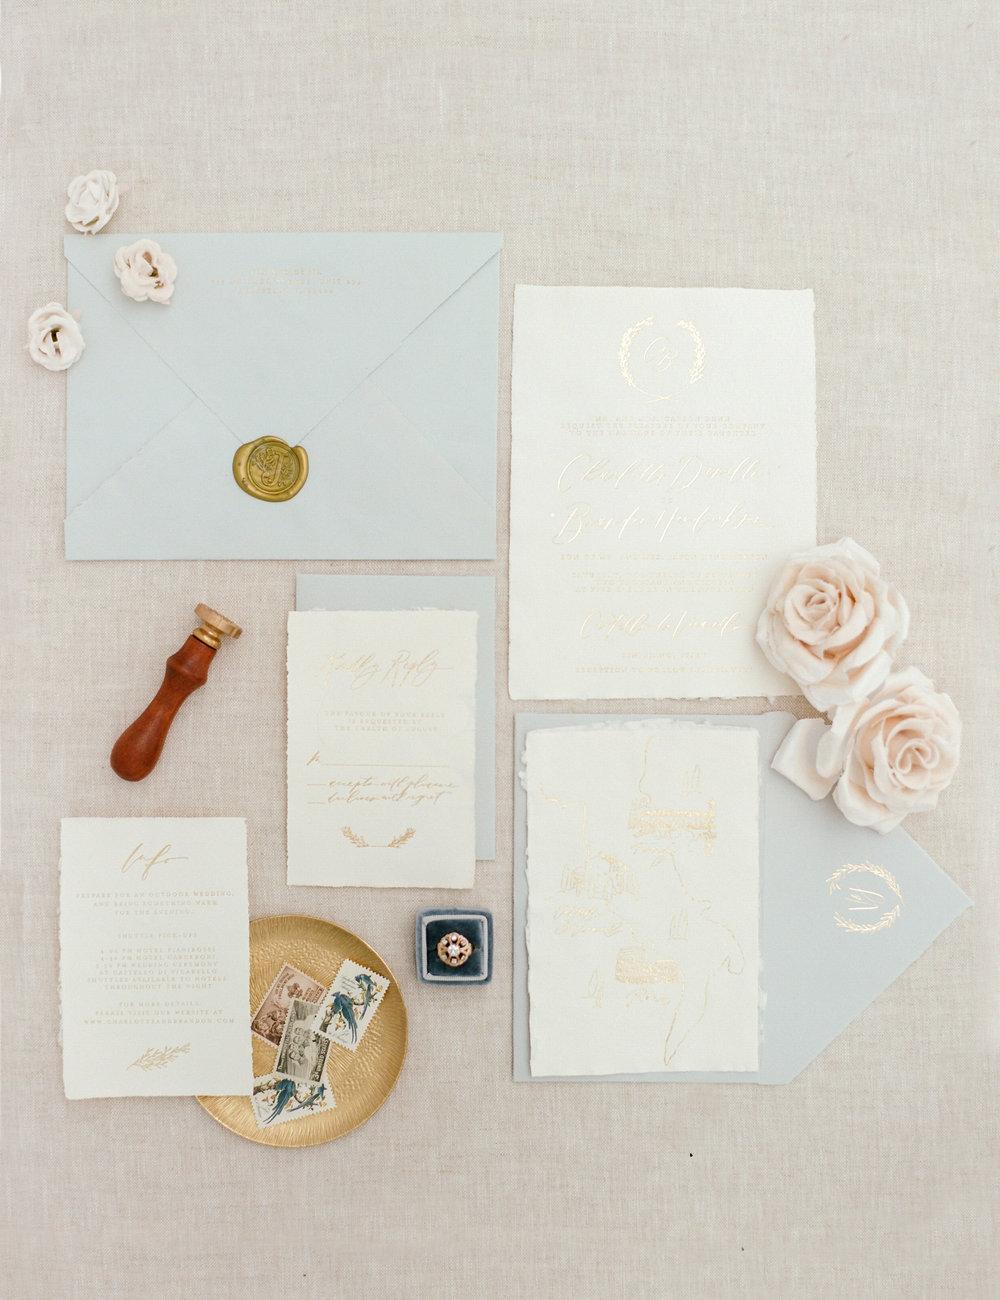 McGovern-Centennial-Gardens-Houston-Texas-Wedding-Venue-Josh-Dana-Fernandez-Photography-Film-Destination-Fine-Art-Luxury-Top-Best-Austin-Dallas-Magnolia-Rouge-Jennifer-Laura-Design-2.jpg